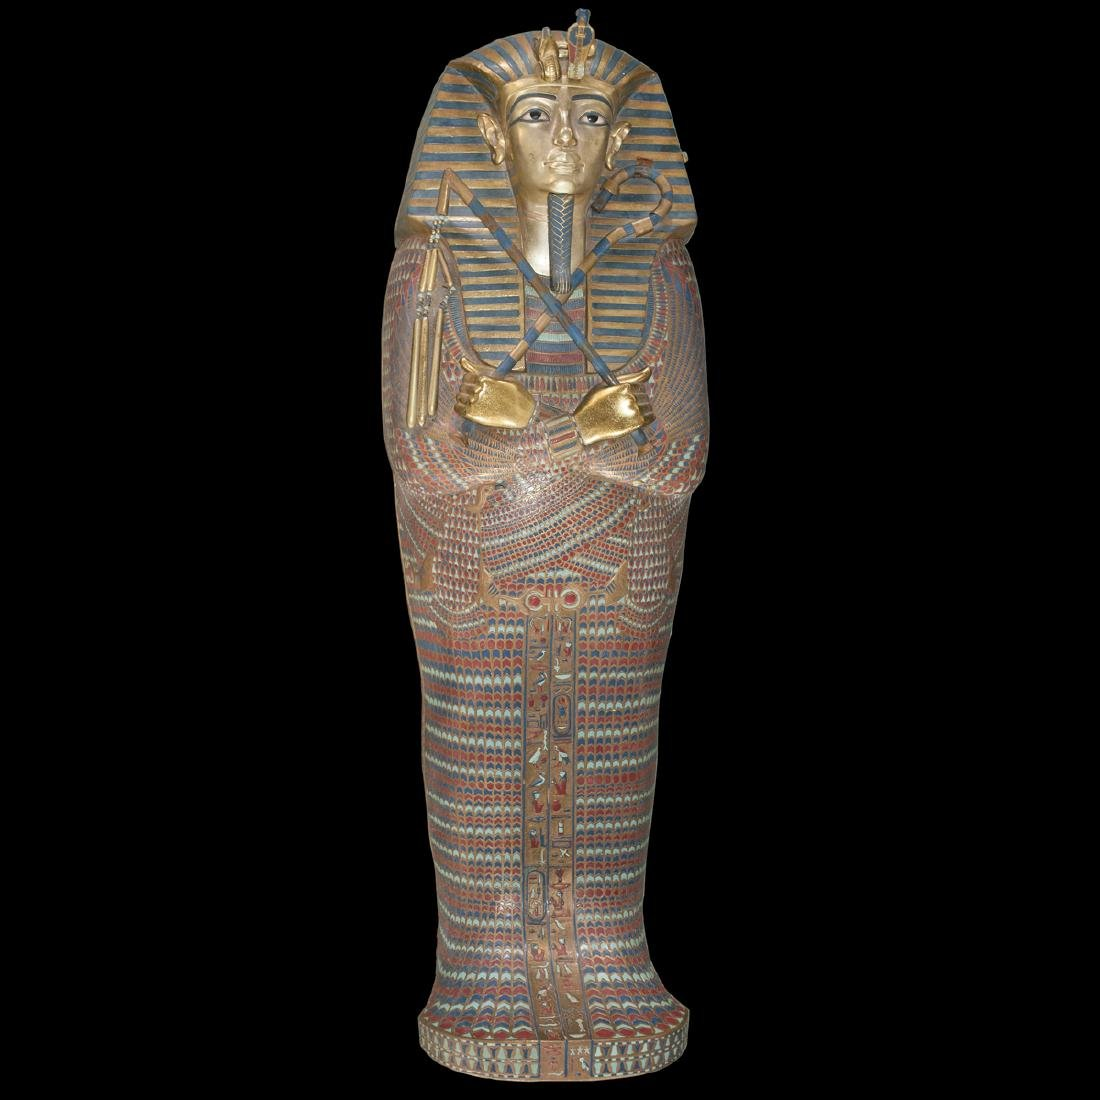 King Tut Replica Sarcophagus